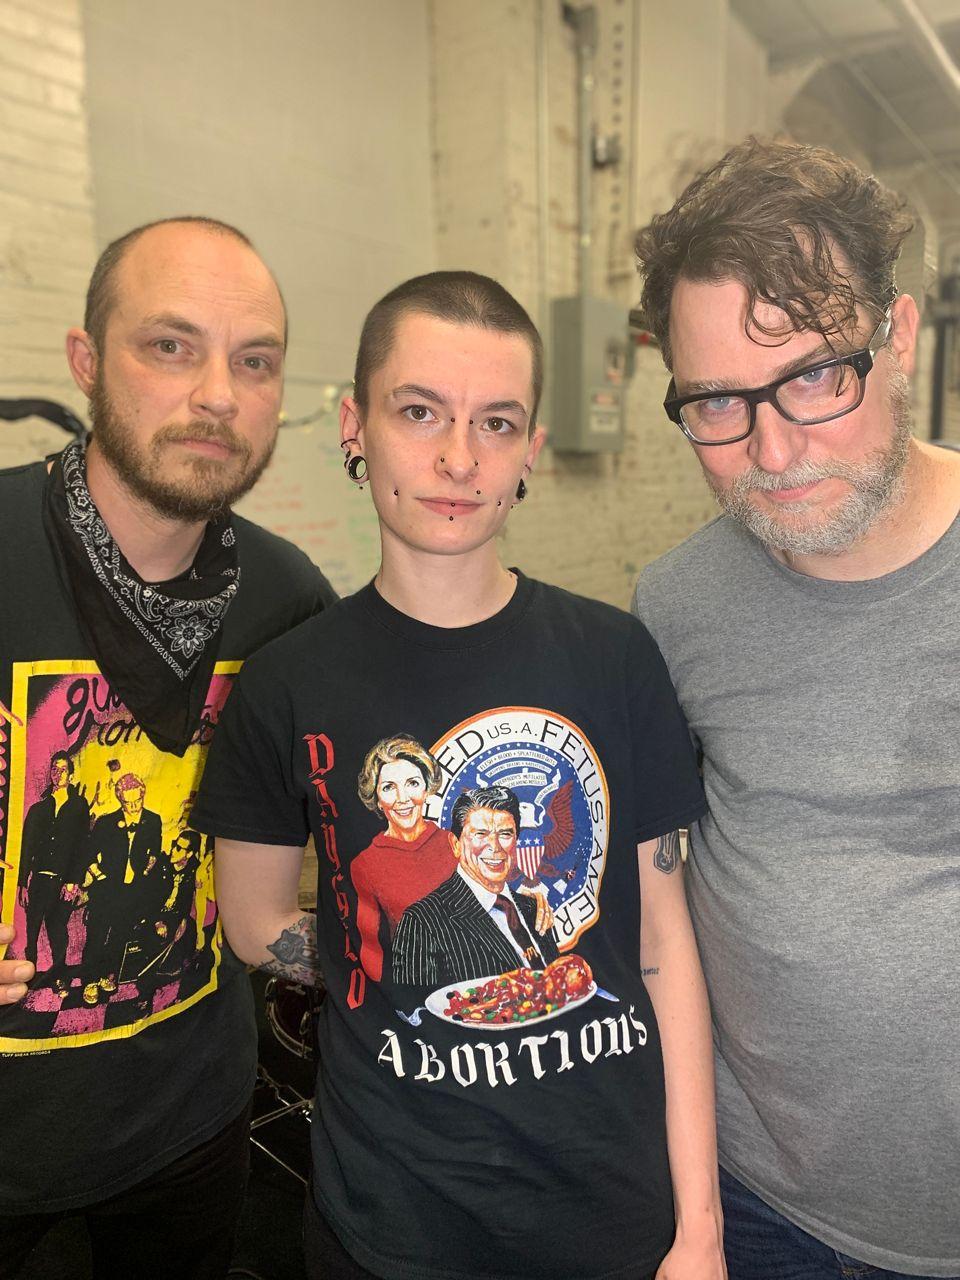 John Panza with the comrades of the group Hiram-Maxim, Fred Gunn and Balmer